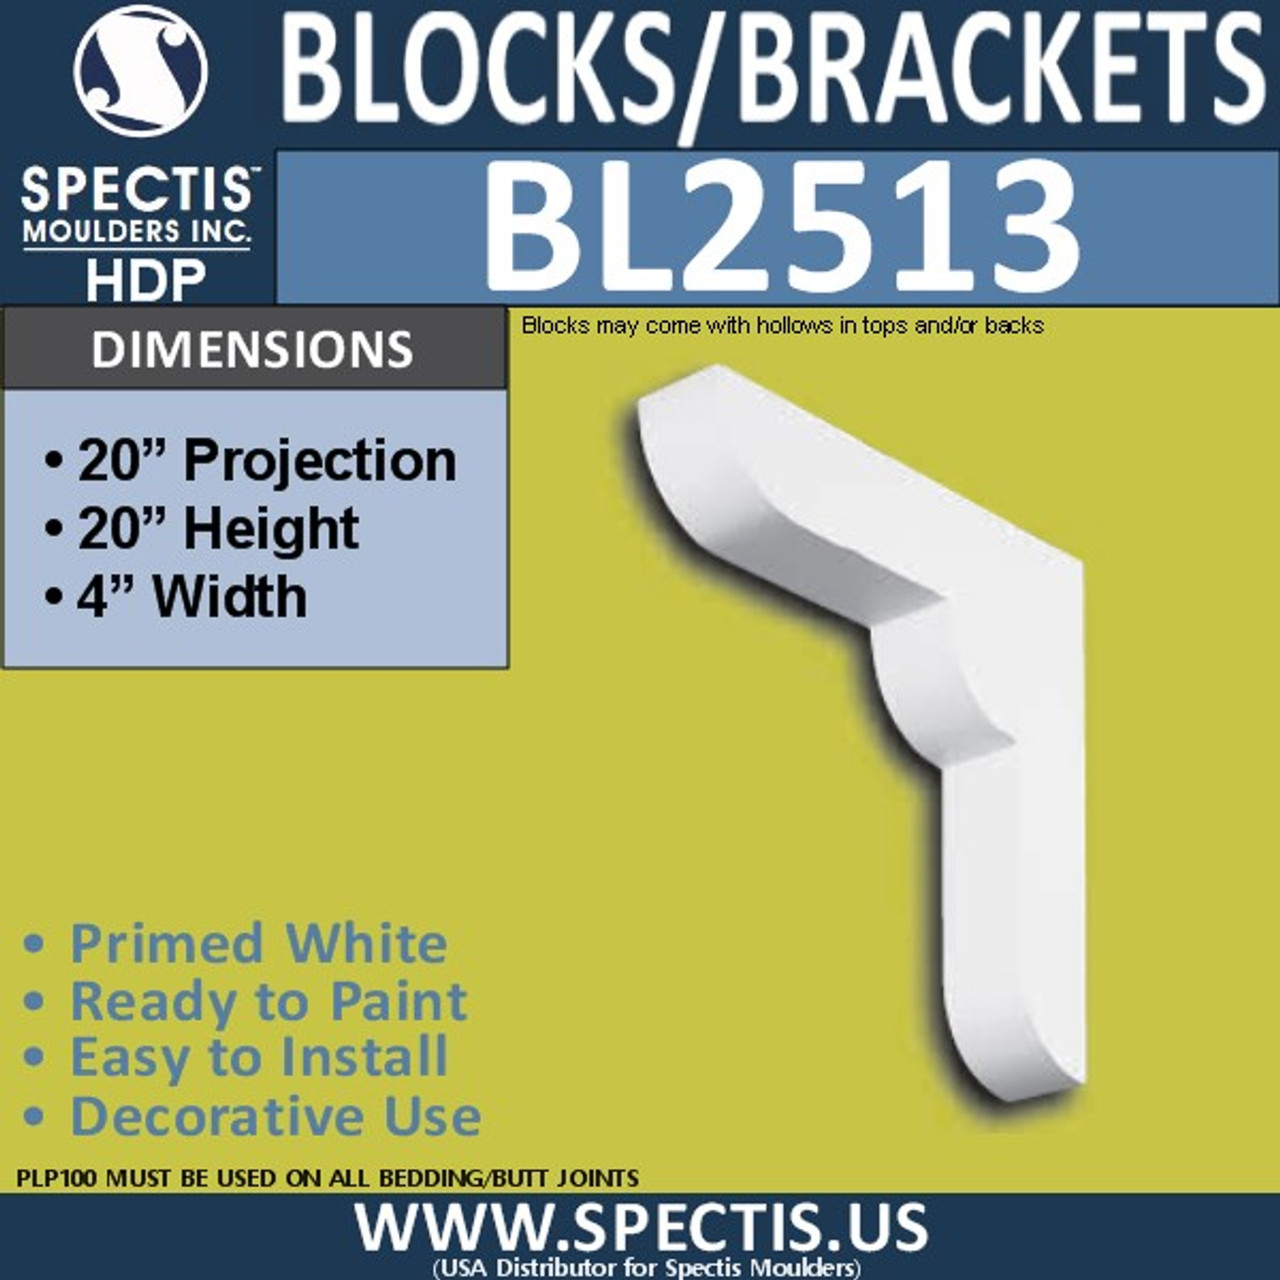 "BL2513 Eave Block or Bracket 4""W x 20""H x 20"" P"